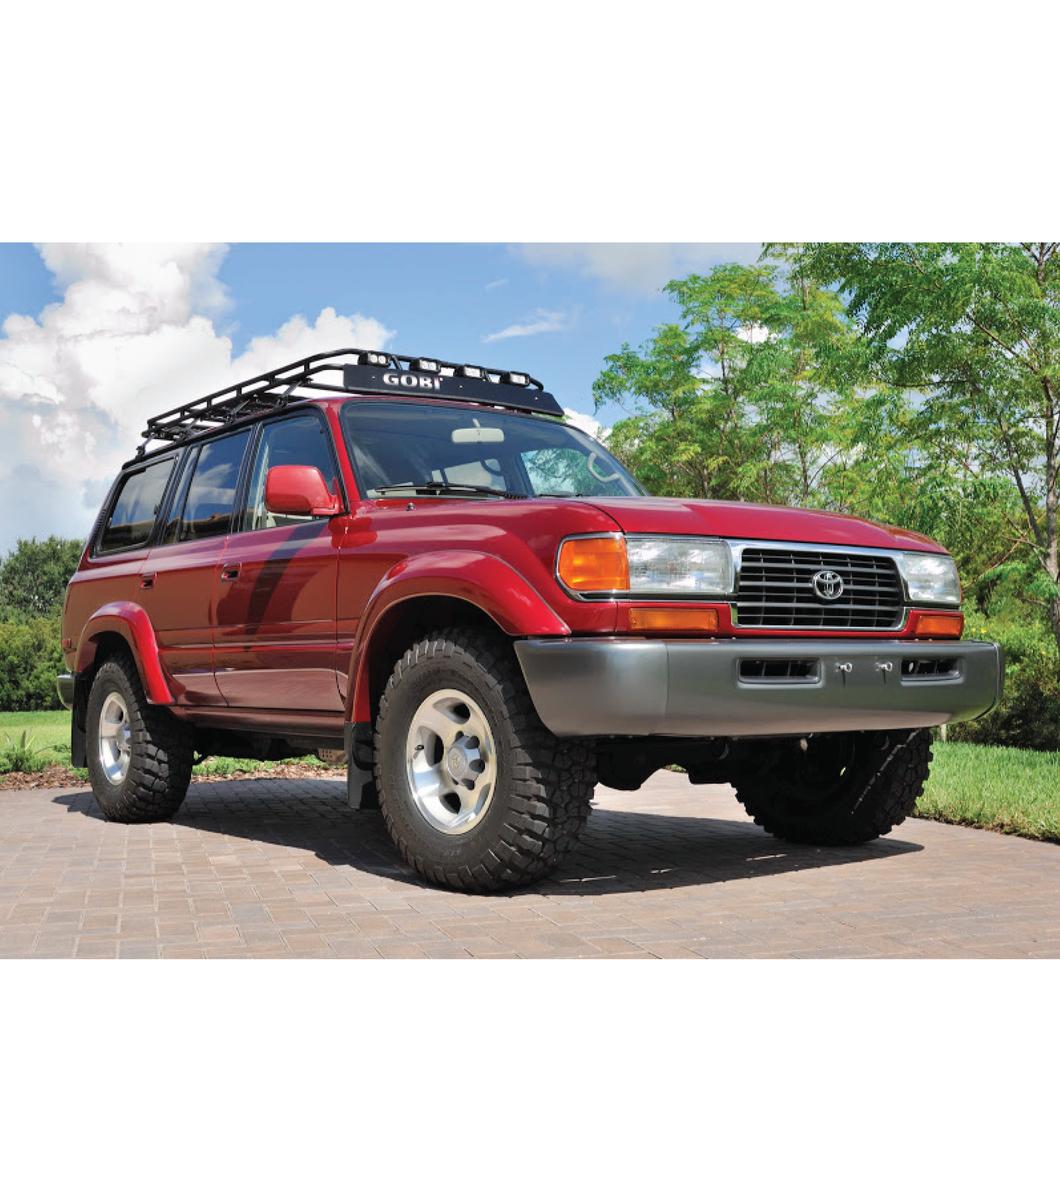 Toyota Landcruiser 80 Series Gobi Racks